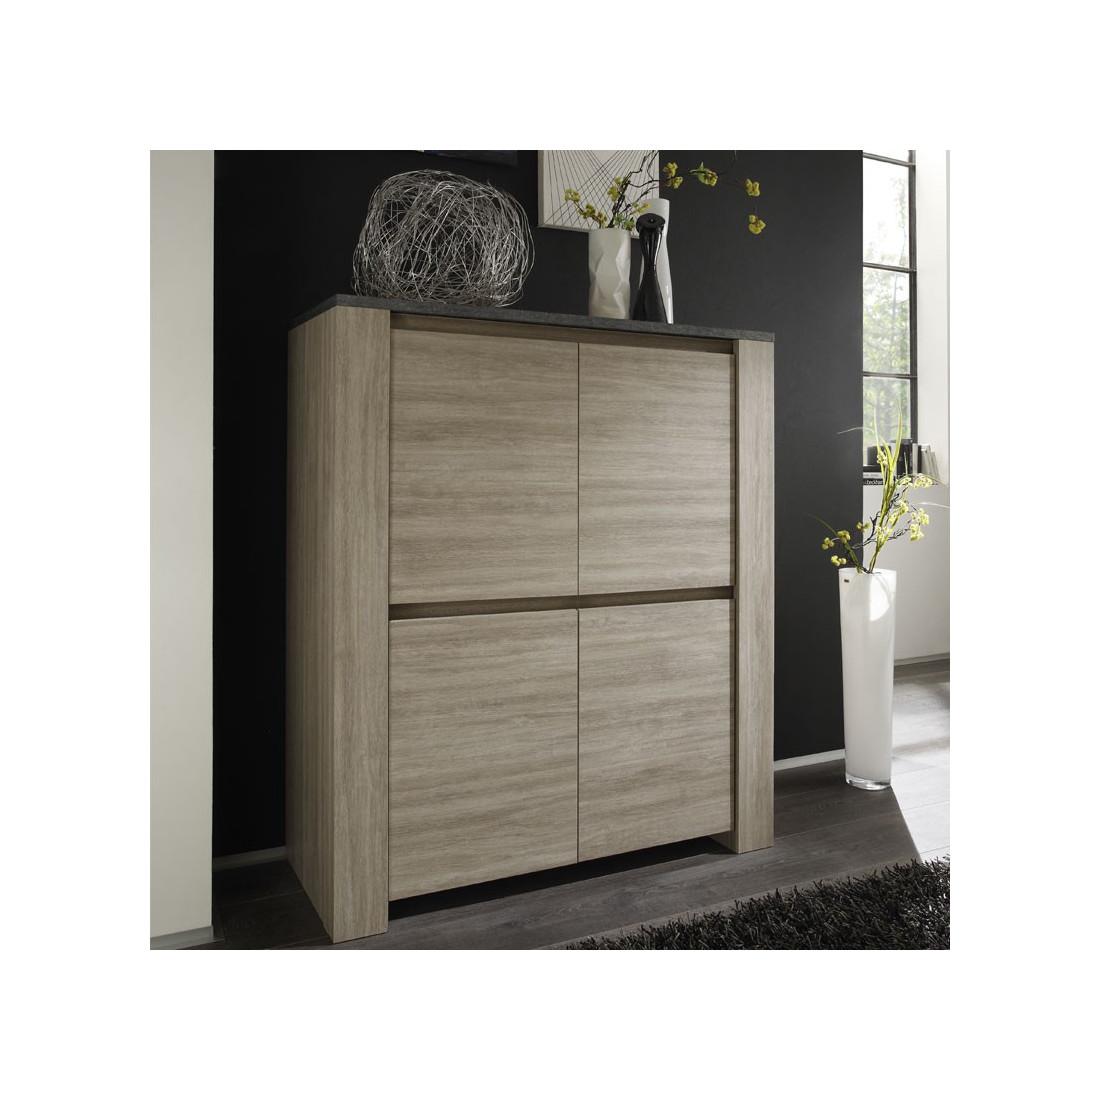 armoire de salon plateau ardoise ardesia univers salle manger. Black Bedroom Furniture Sets. Home Design Ideas